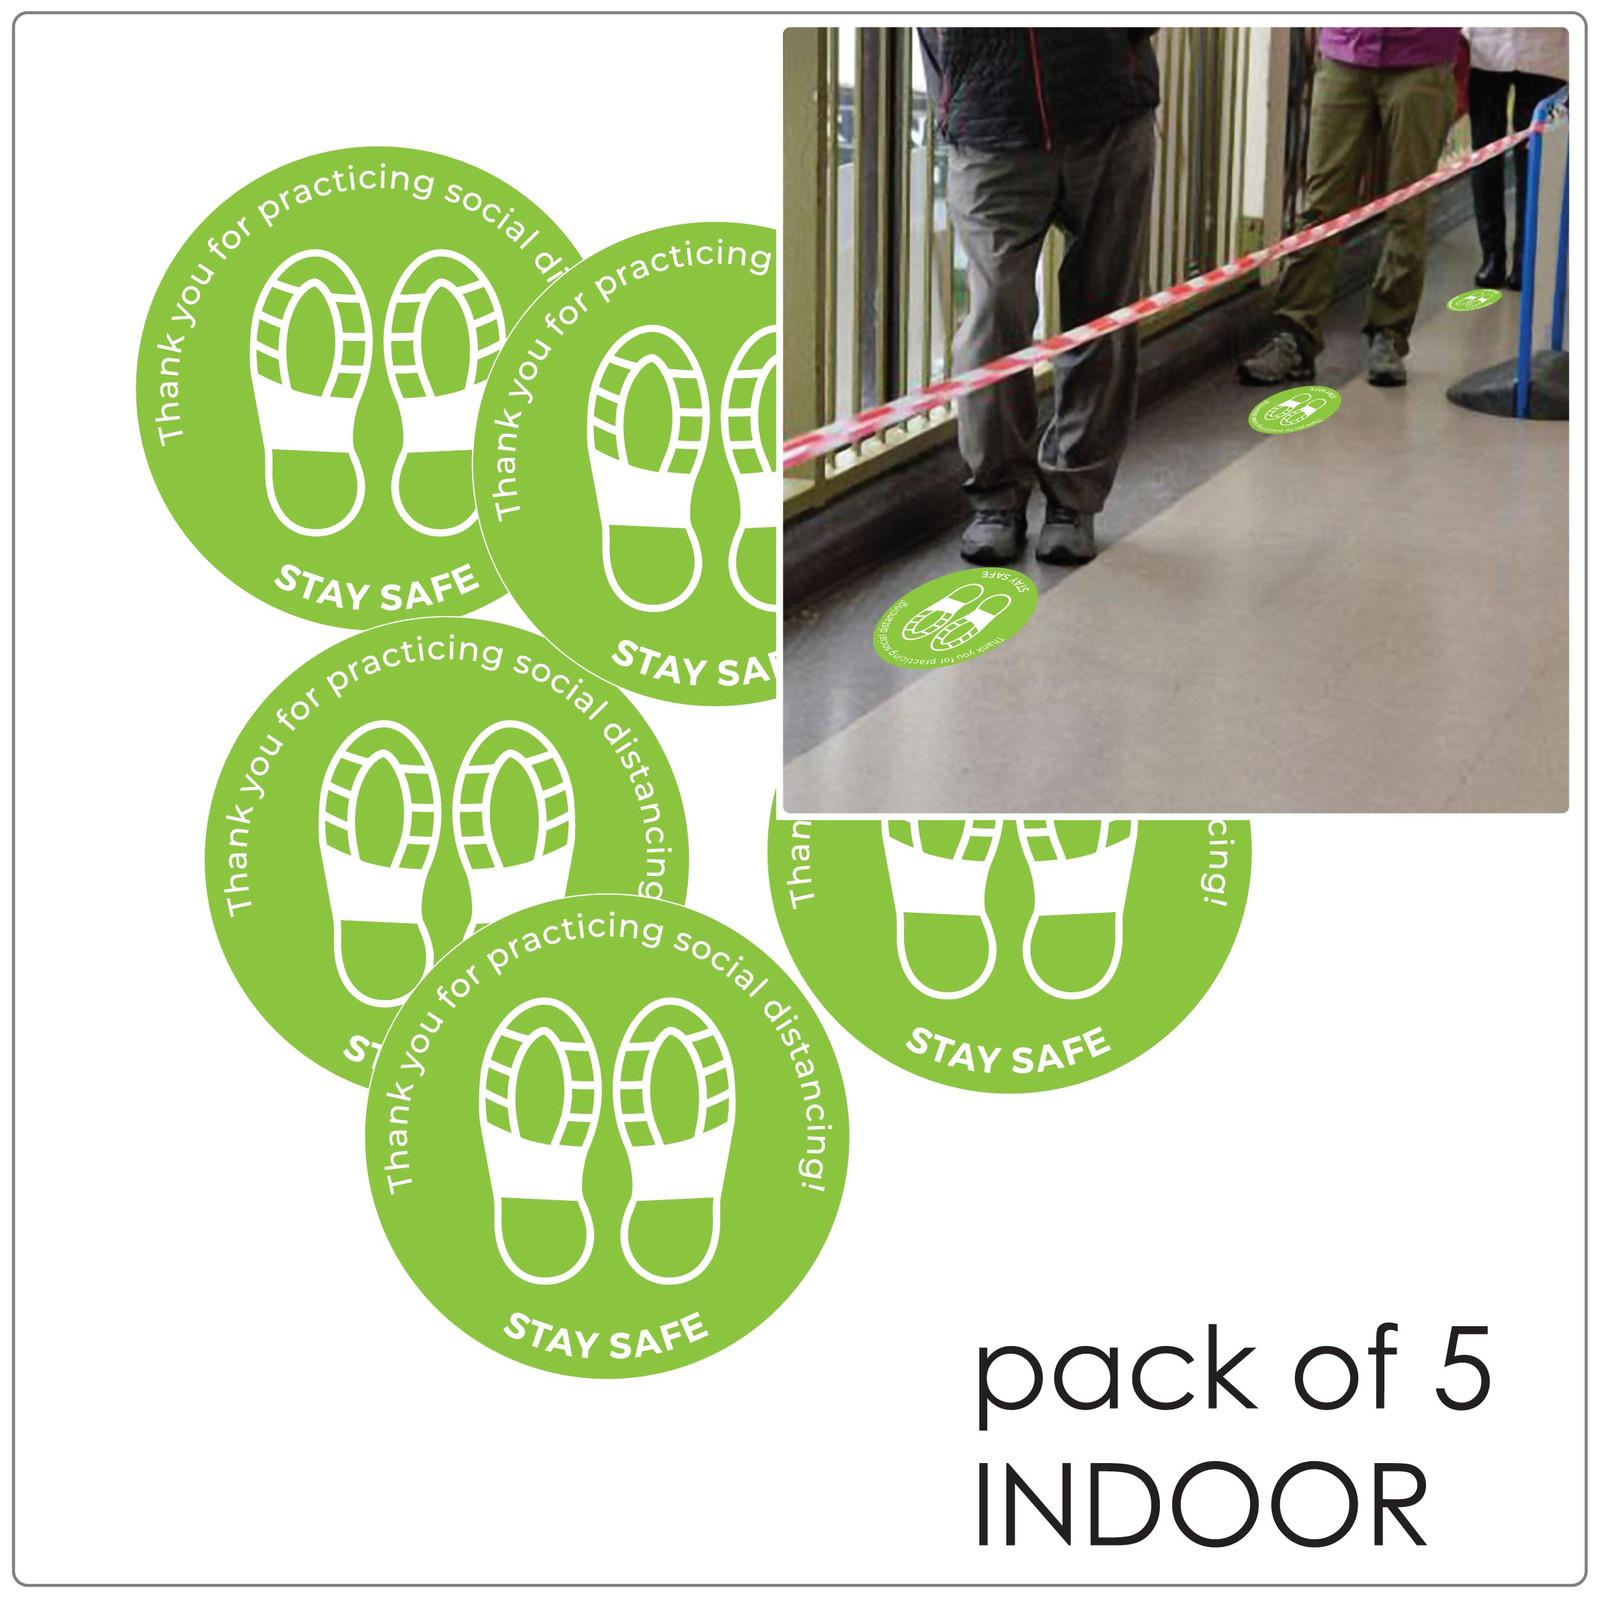 social distancing floor sticker for hard floors, pack of 5, green Self-adhesive Corona virus floor sticker to help social distancing.